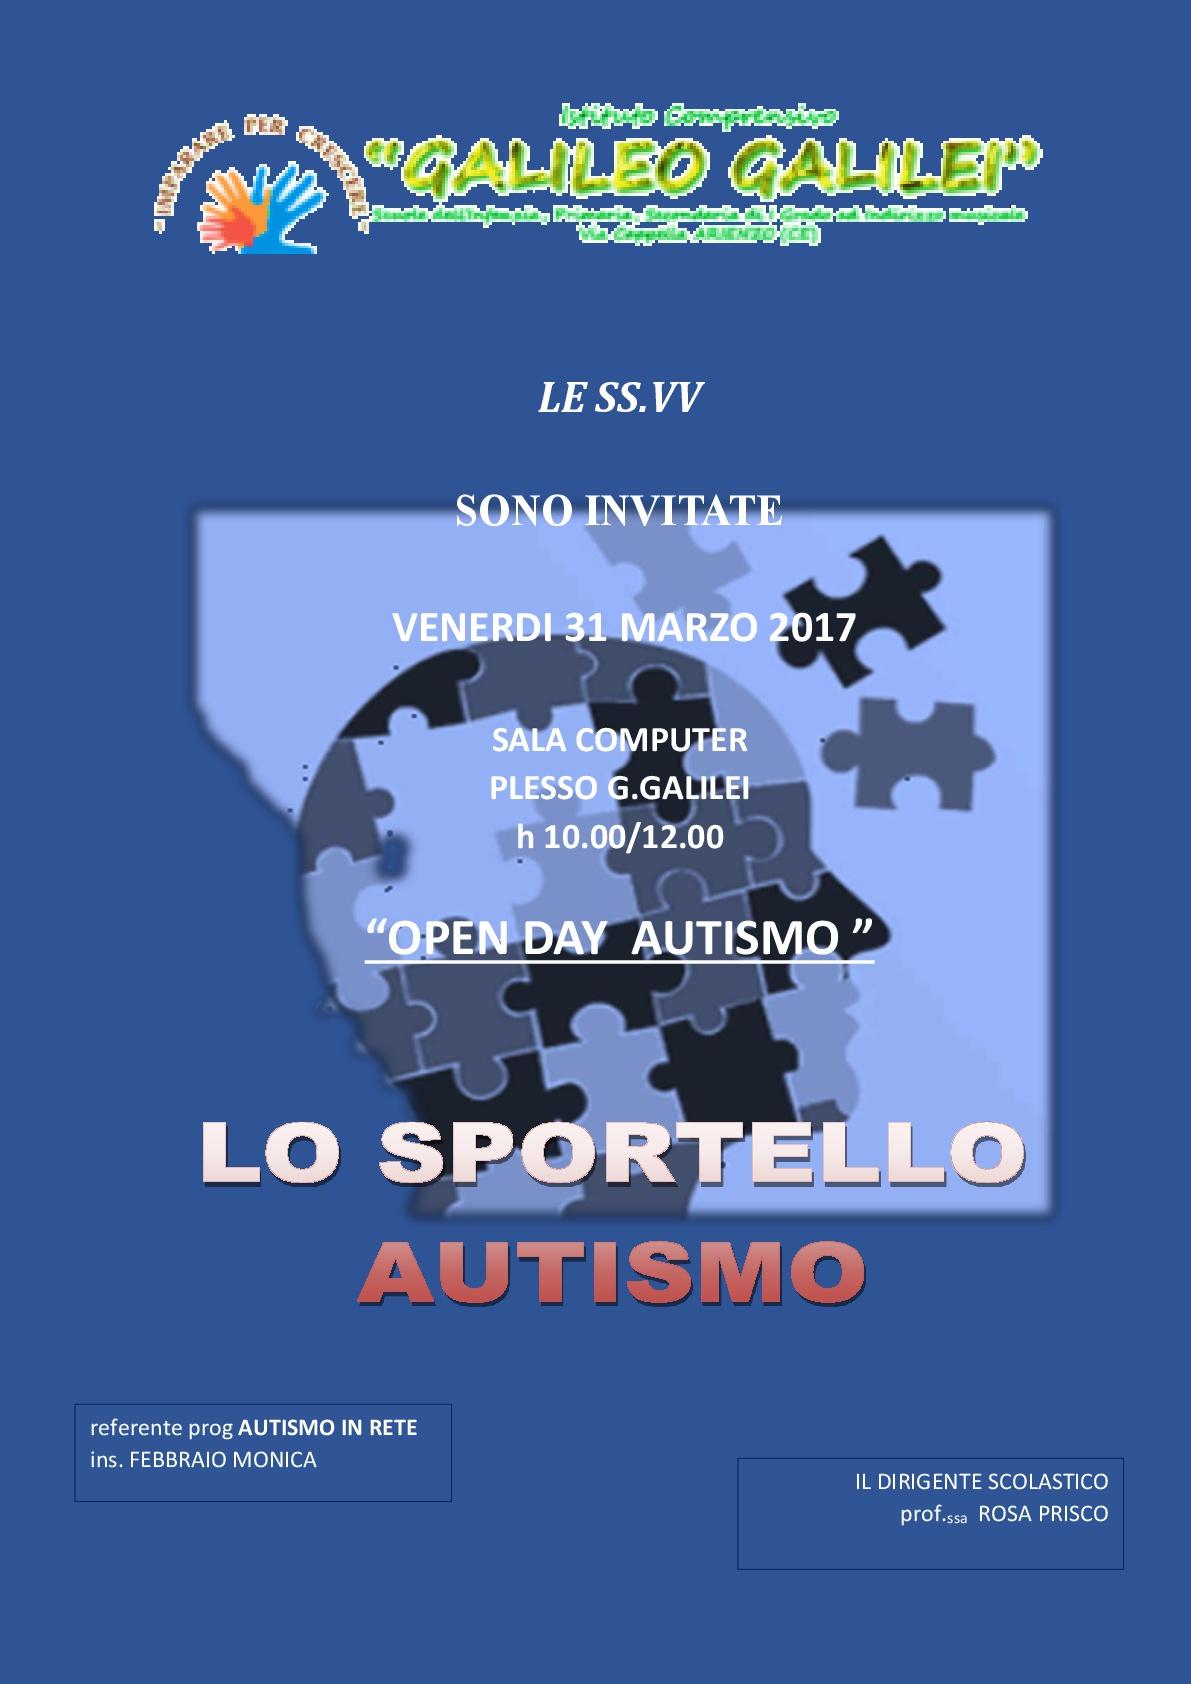 locandina-autismo-001